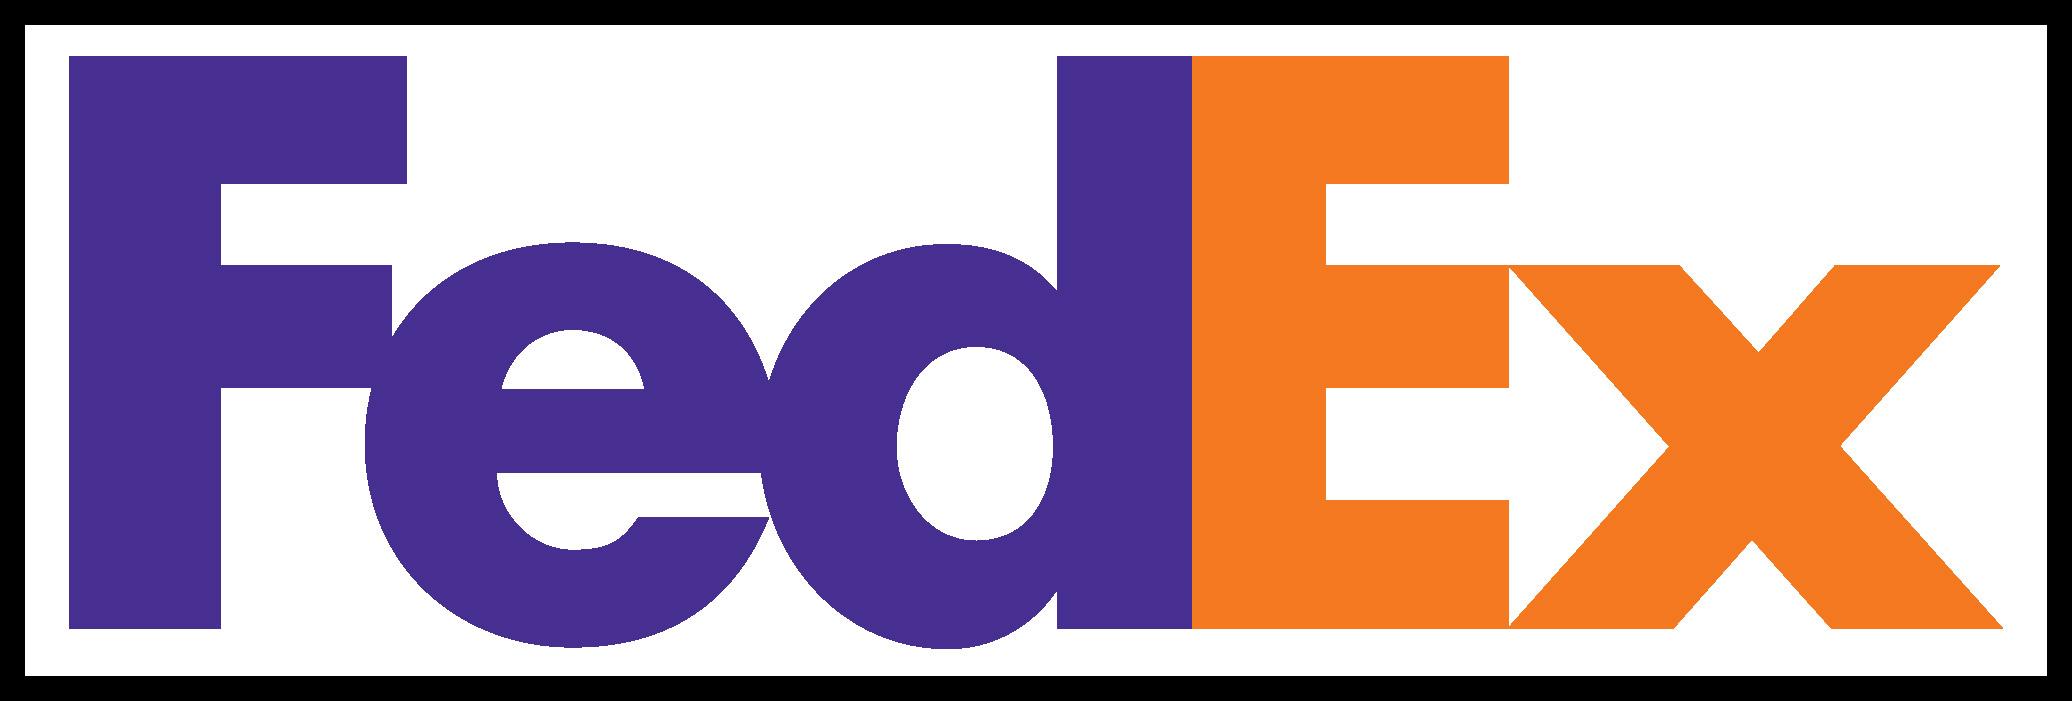 Nice Images Collection: Fedex Desktop Wallpapers